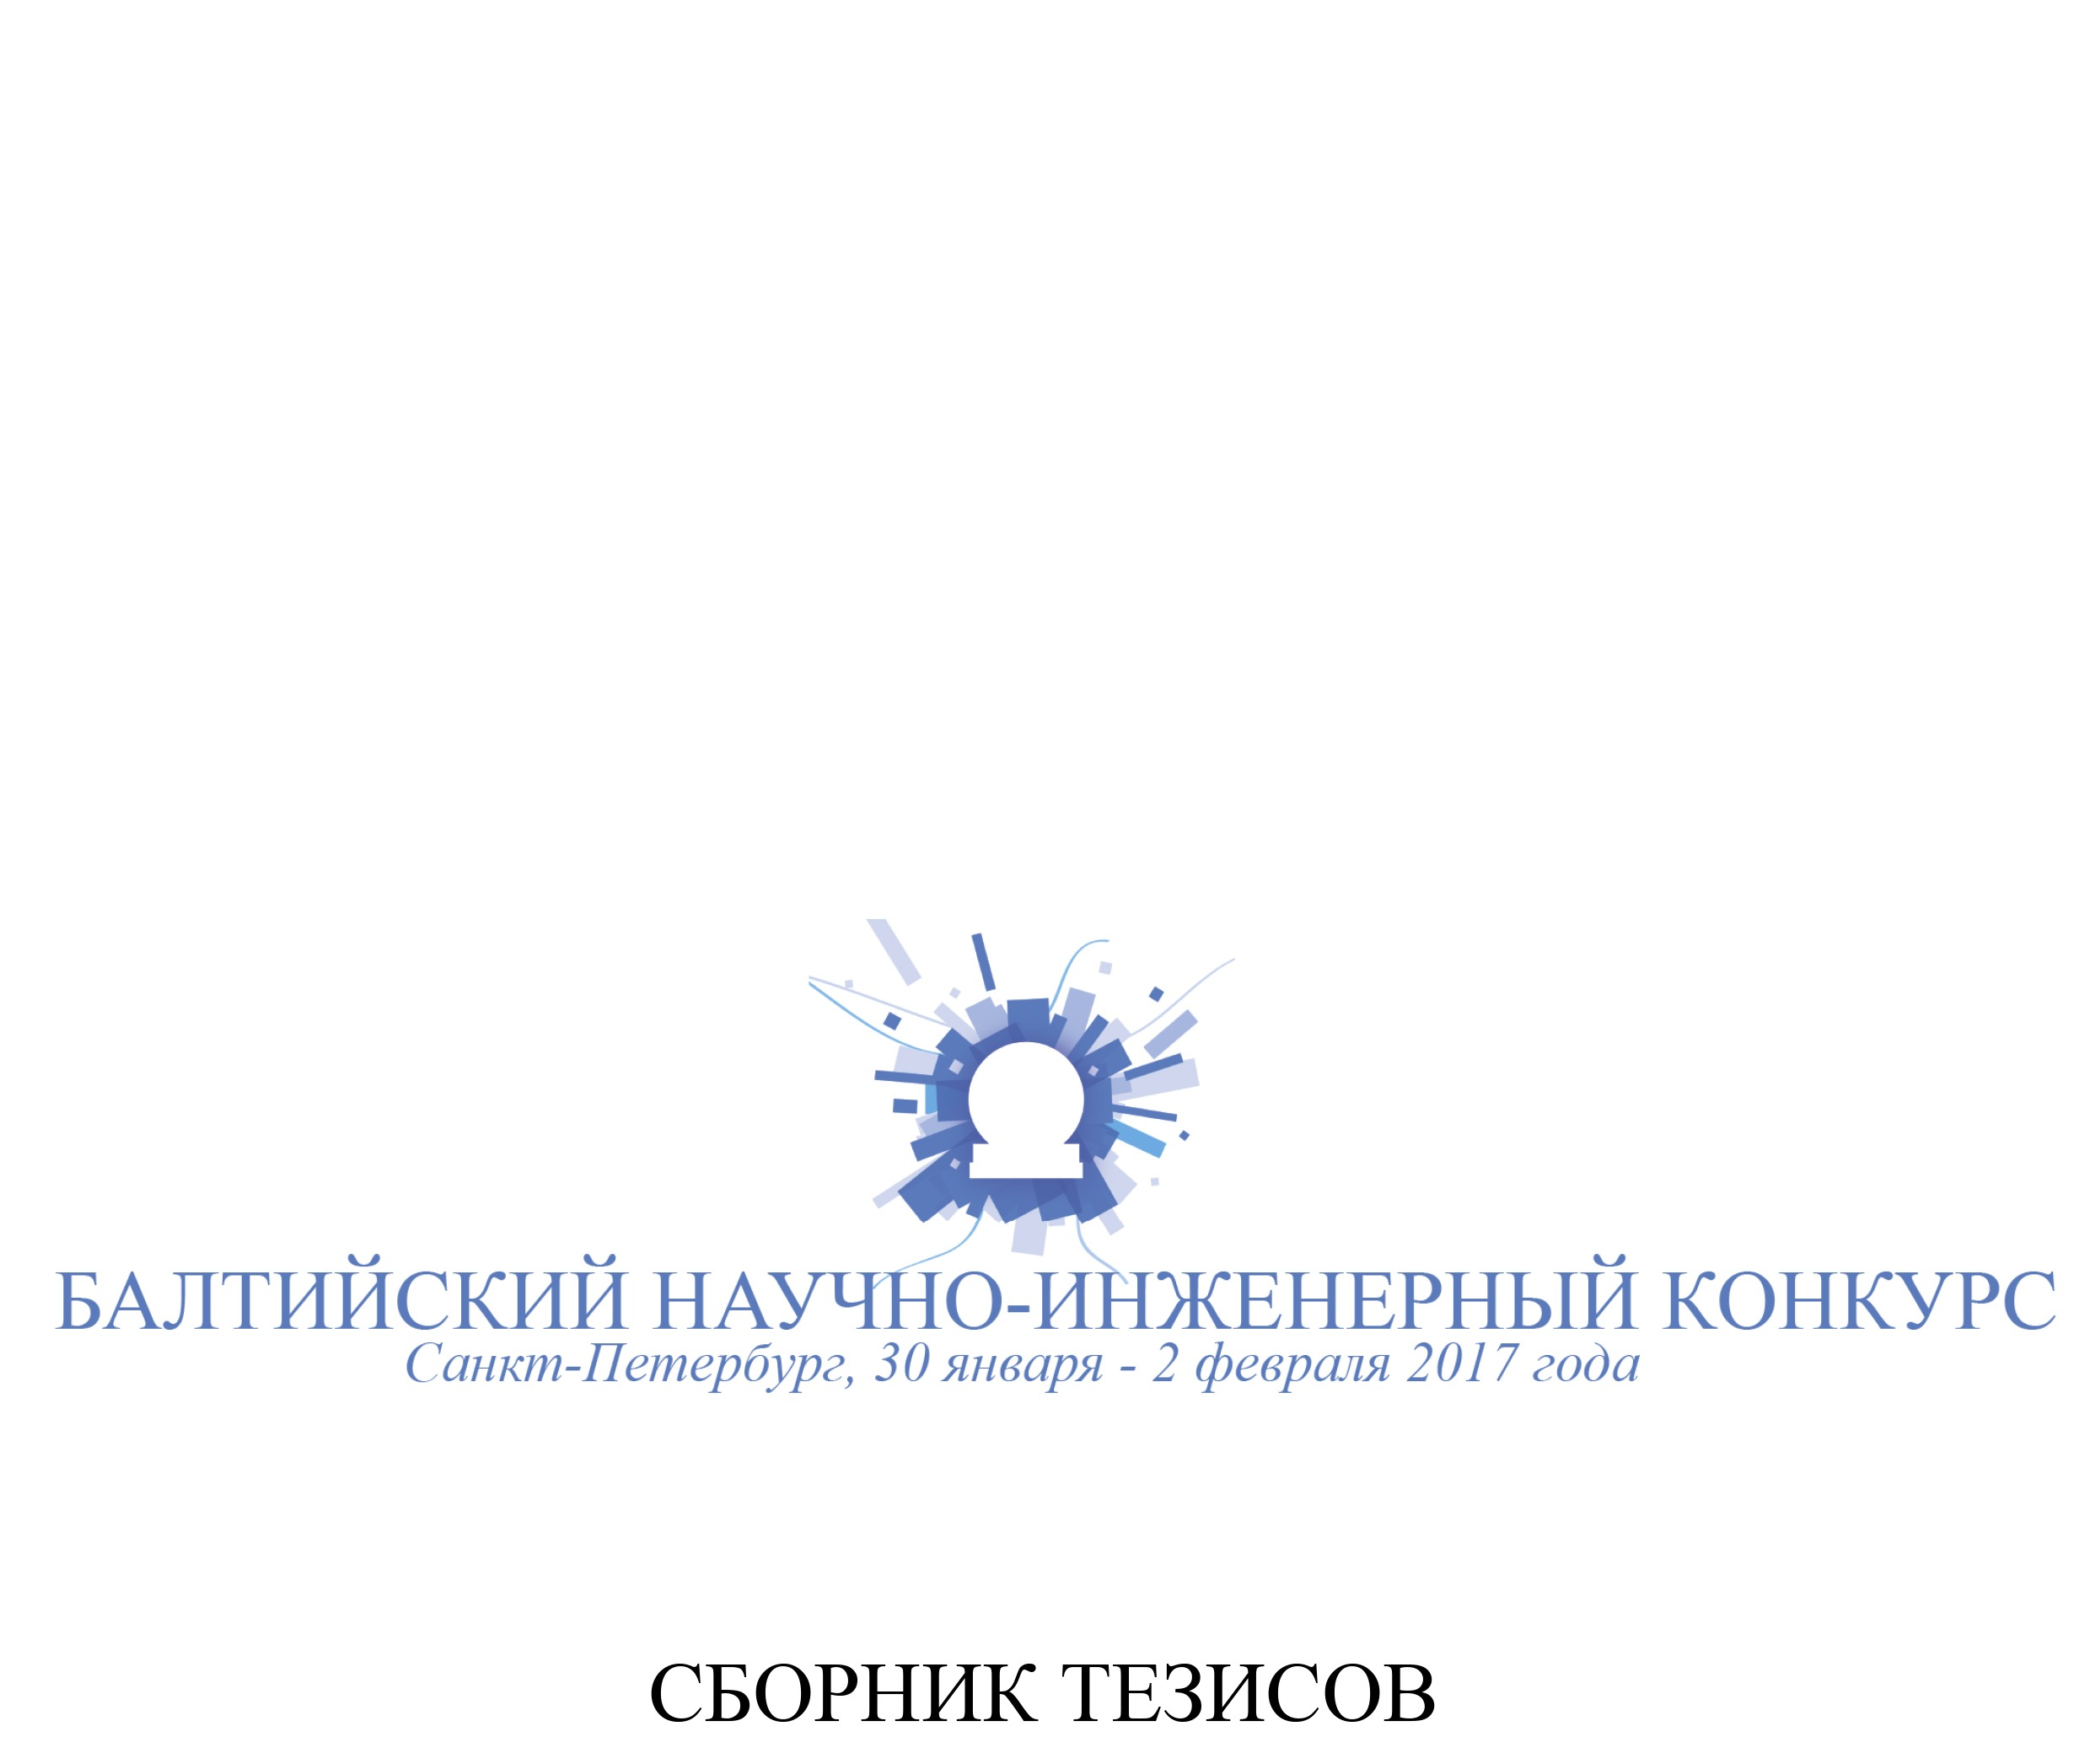 Сборник тезисов-1